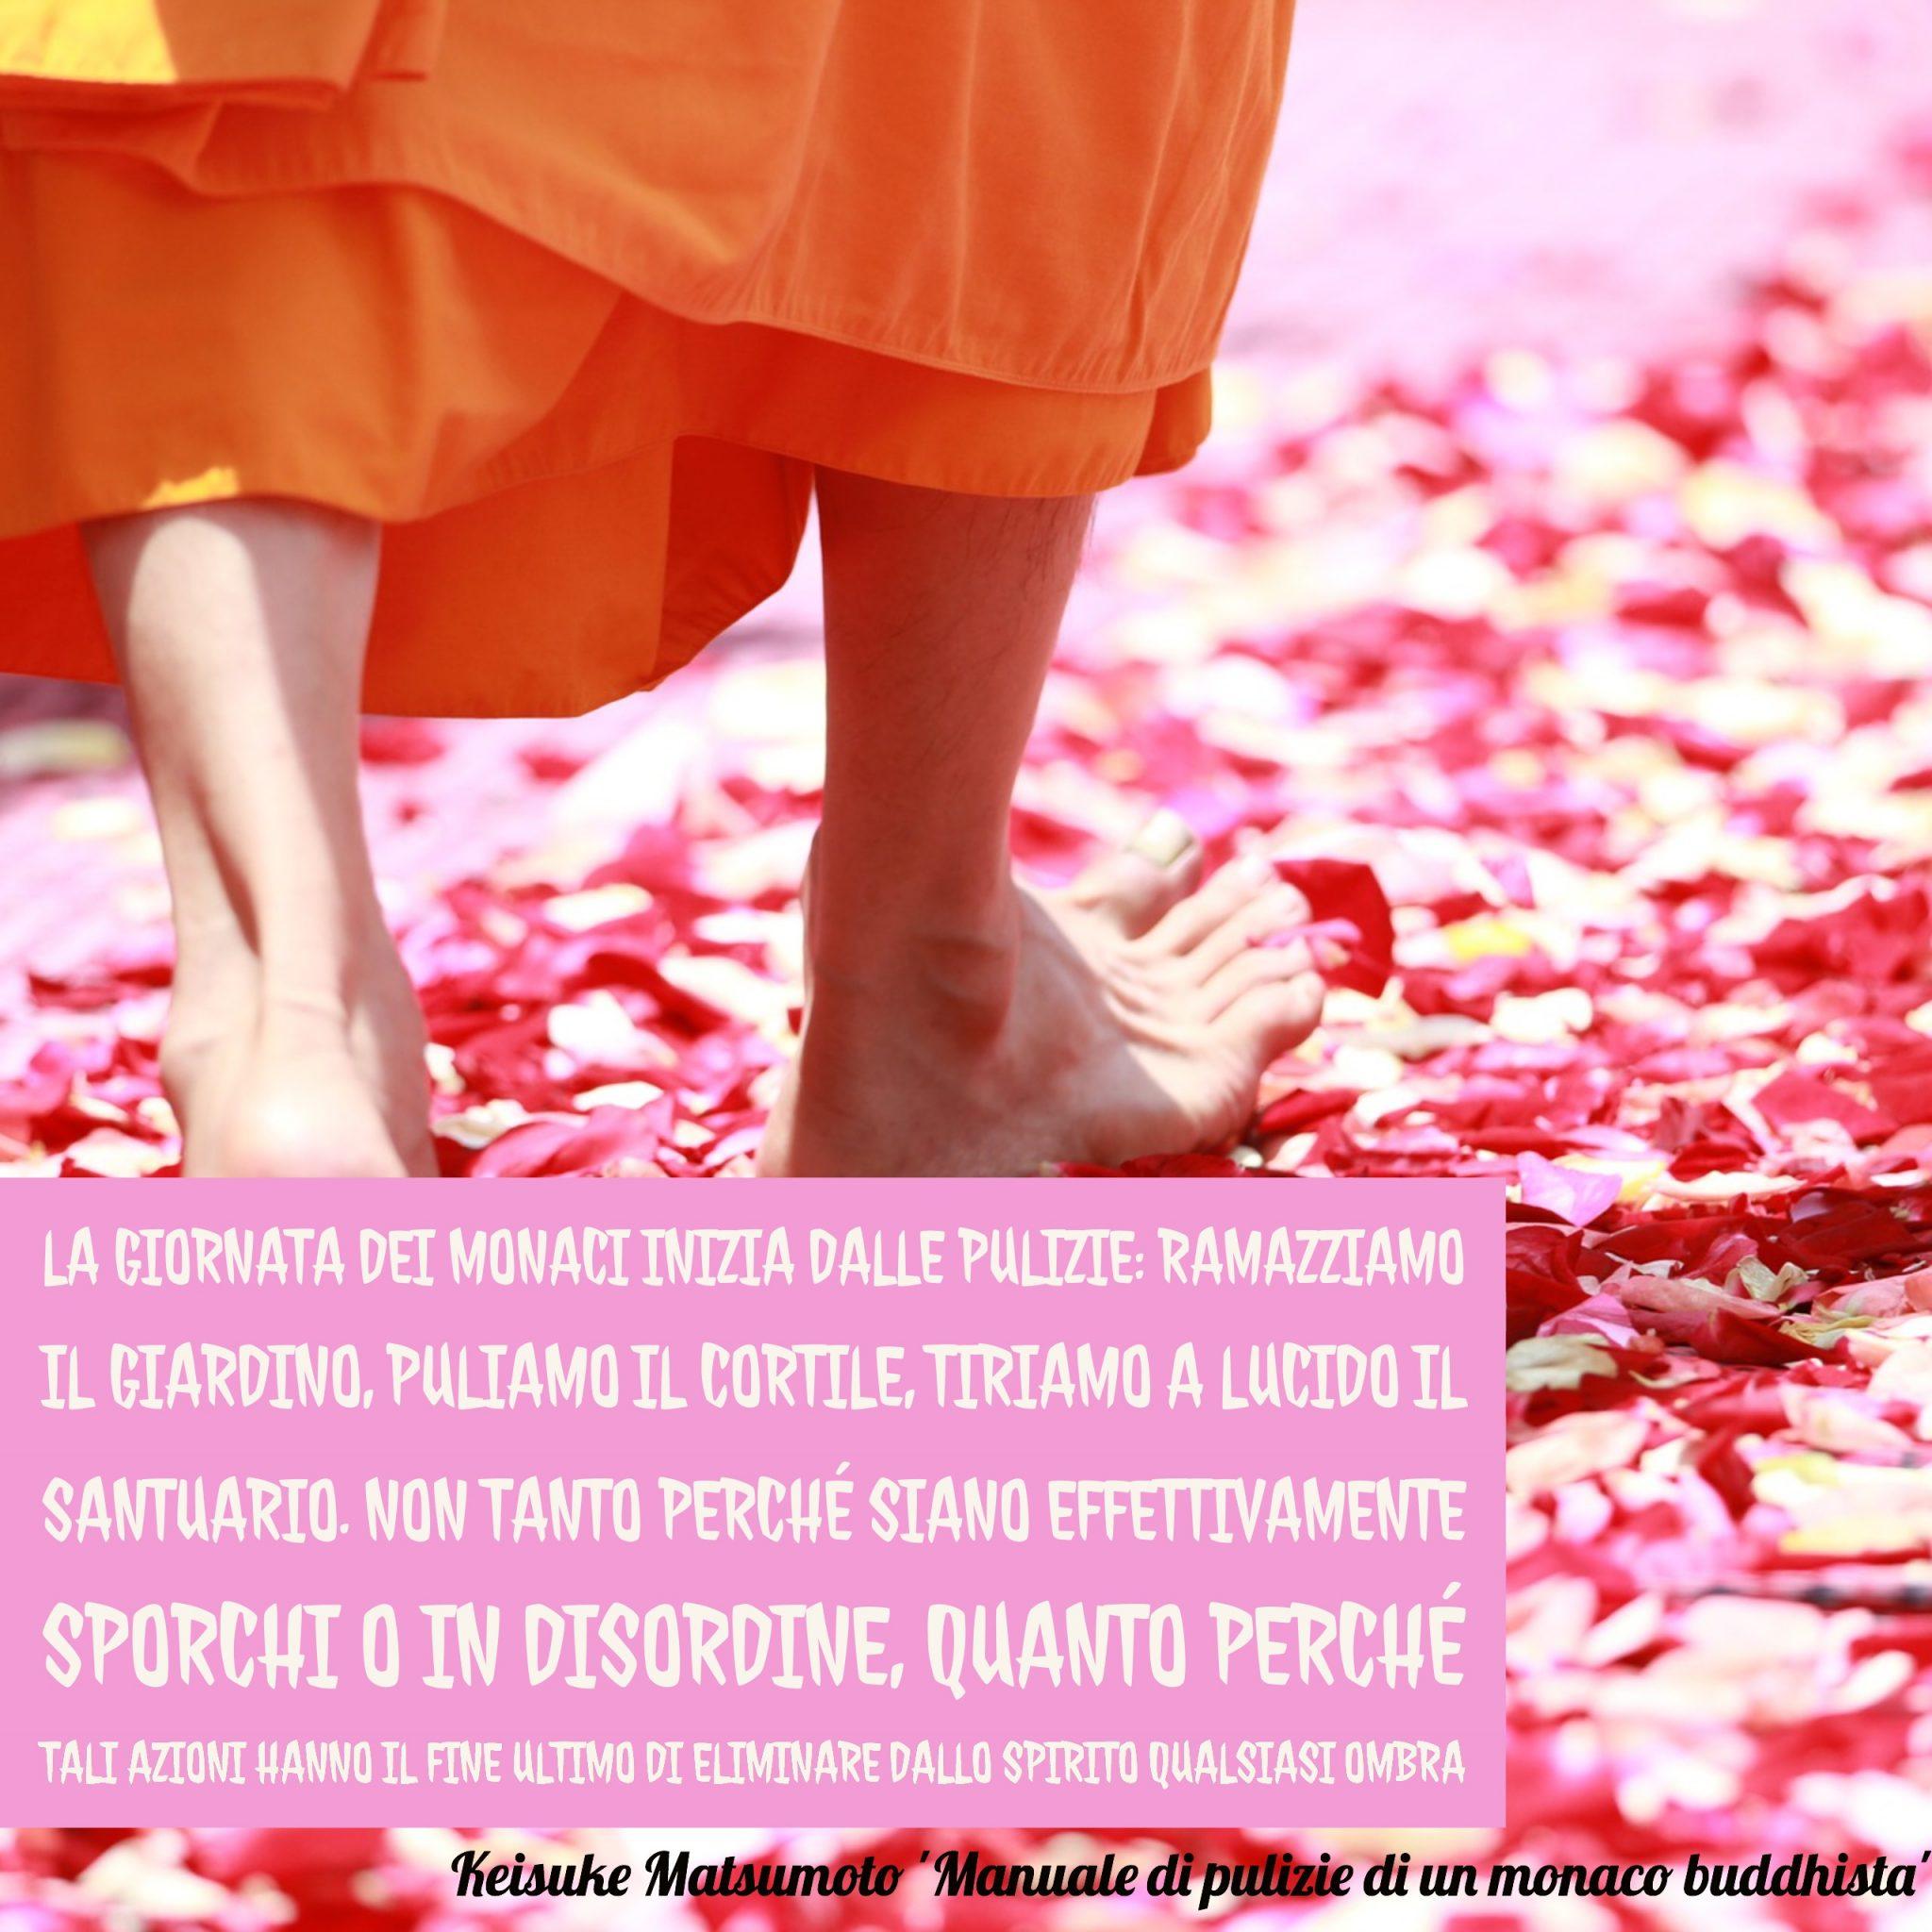 Manuale di pulizie di un Monaco buddhista - immagine in CC pubblicata da tatianaberlaffa.com